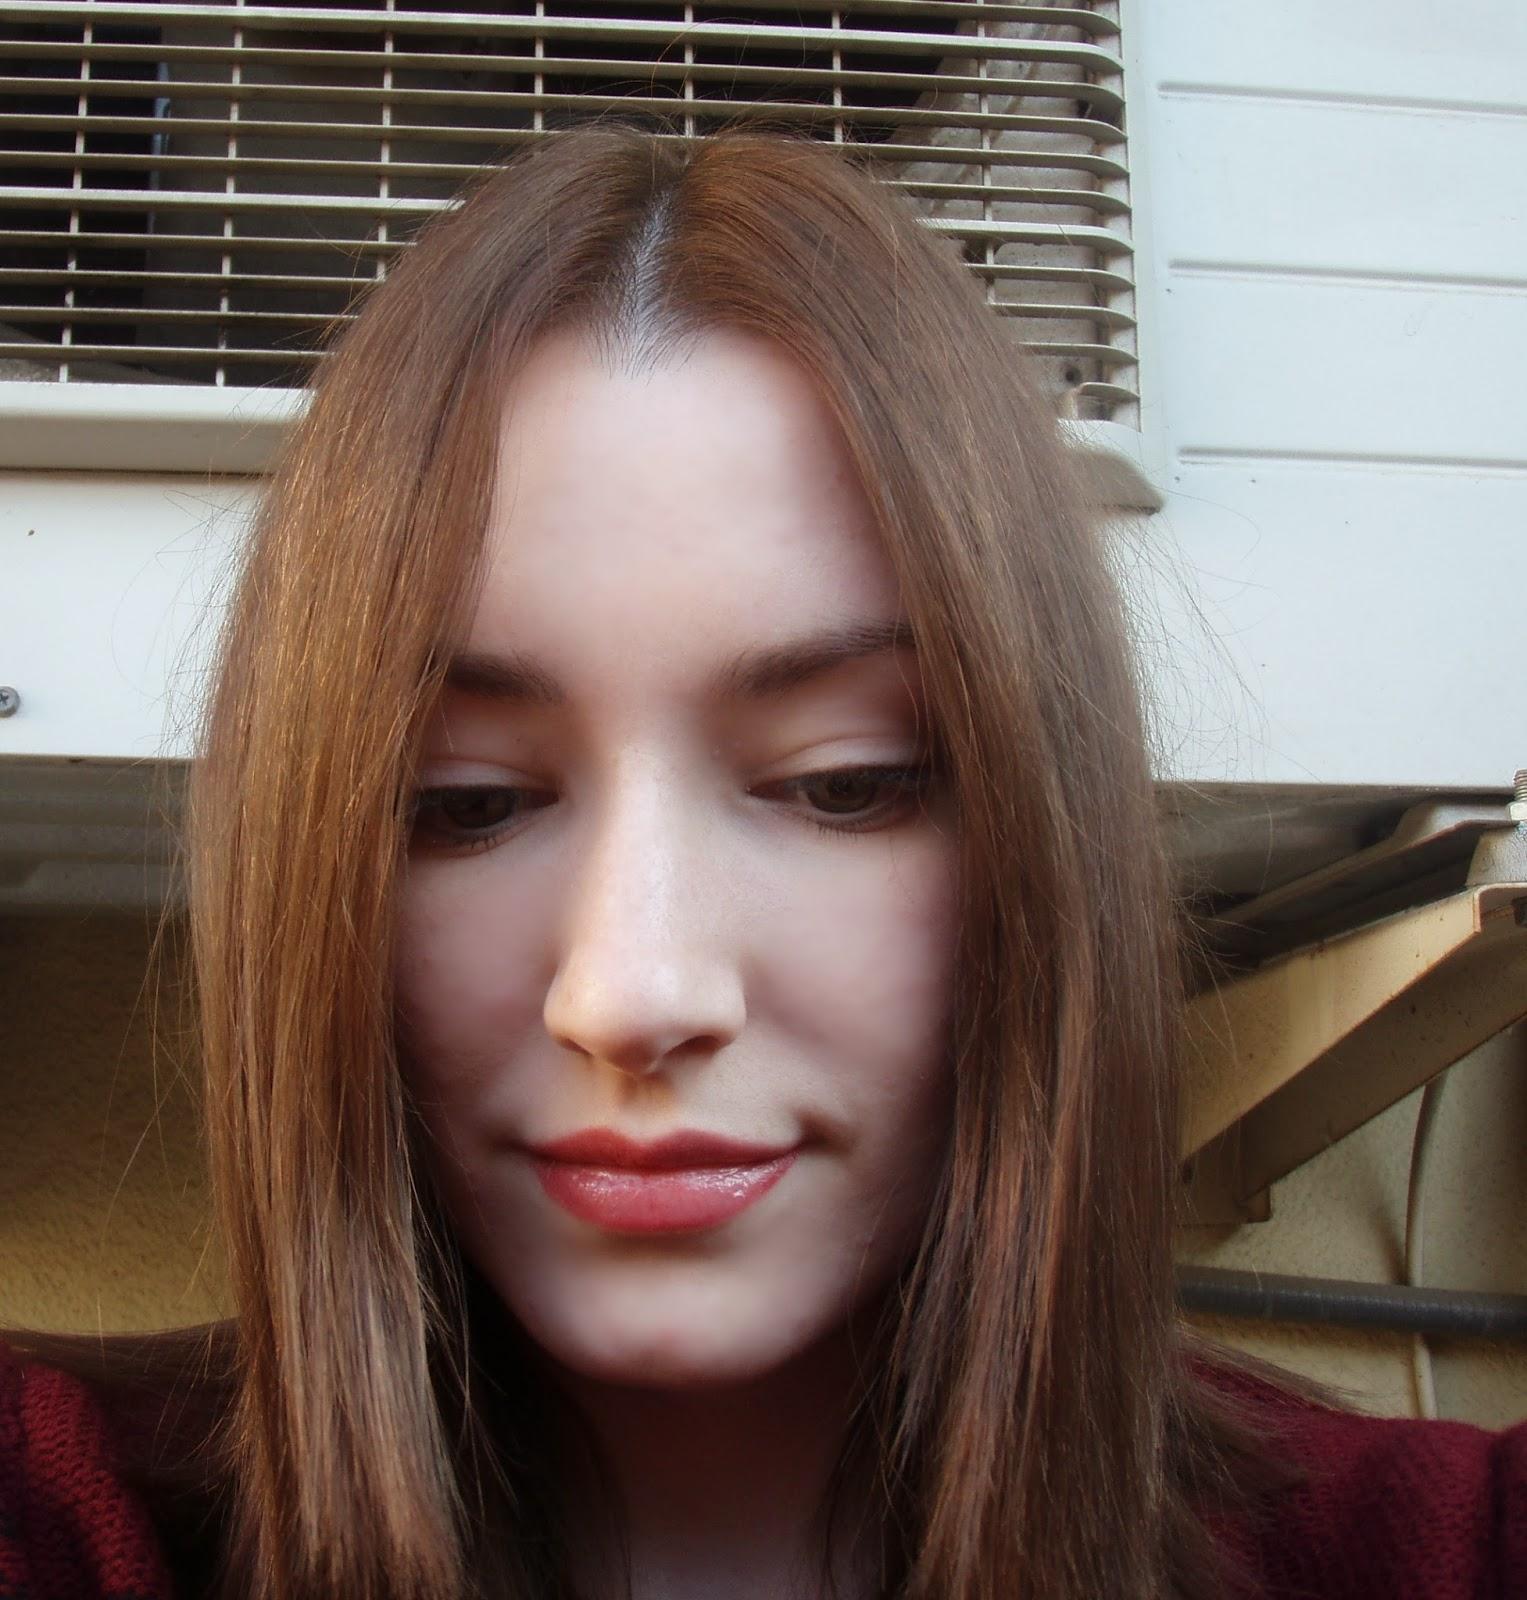 Raiz del cabello mas clara